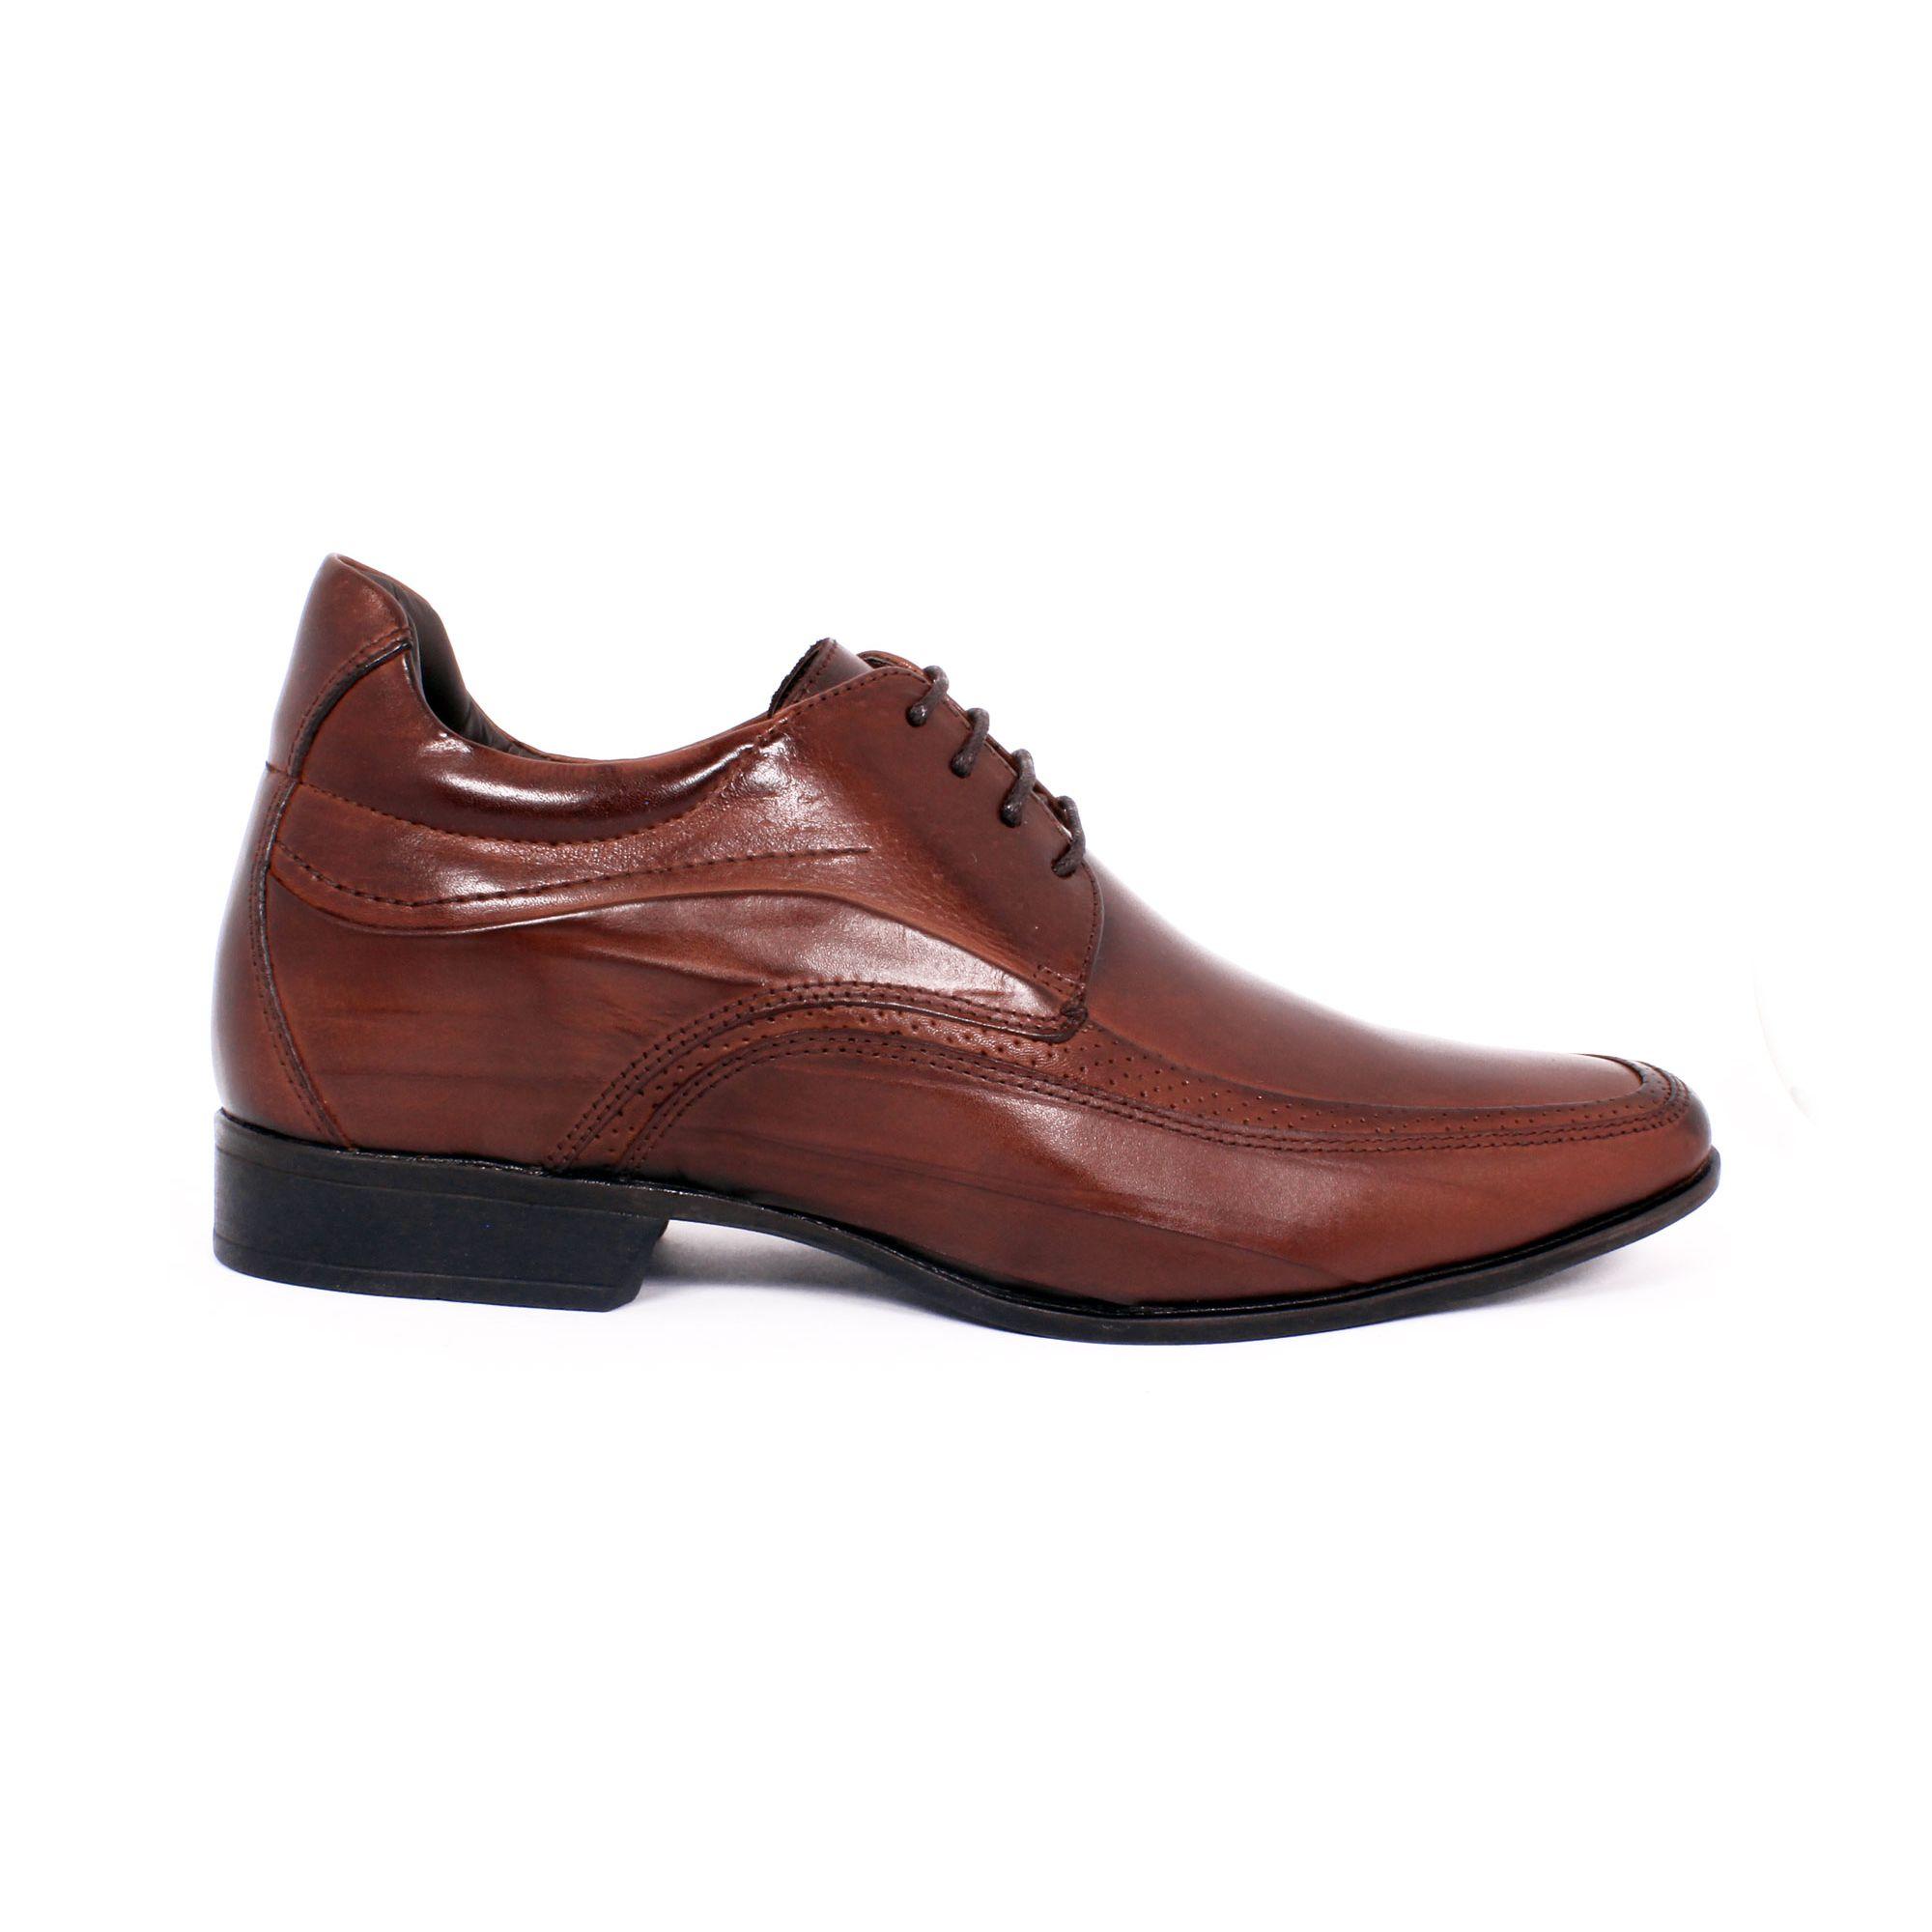 Zapato Formal Manager Café Max Denegri +7cms de Altura_70840